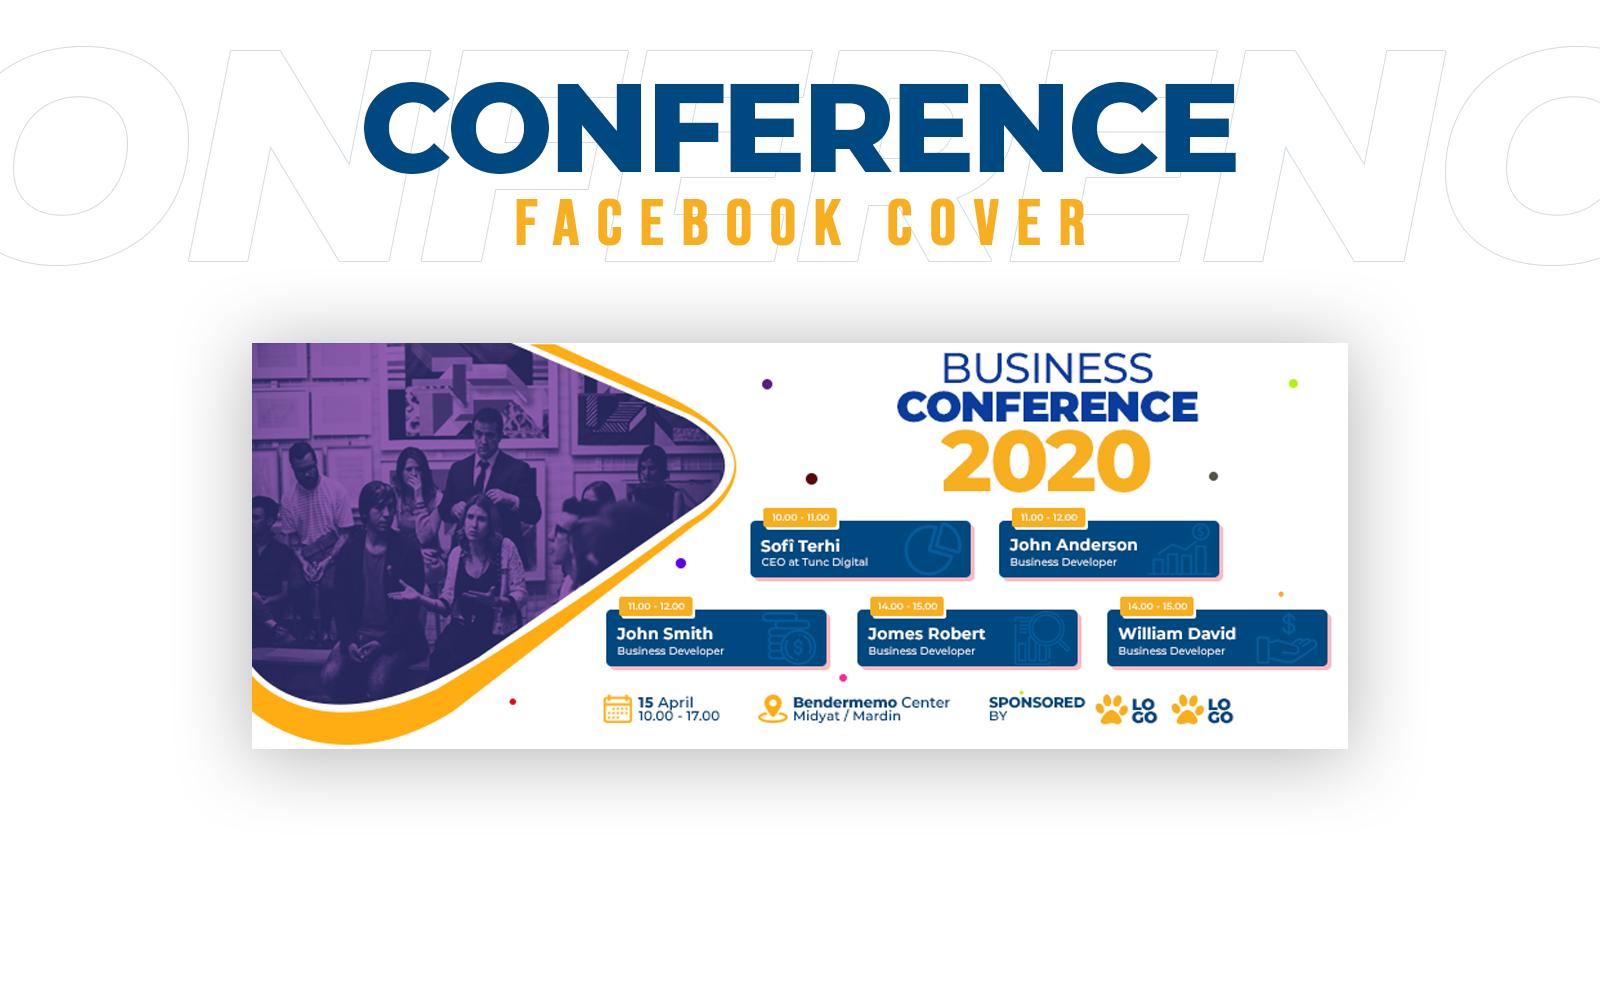 Conference Facebook Cover Social Media